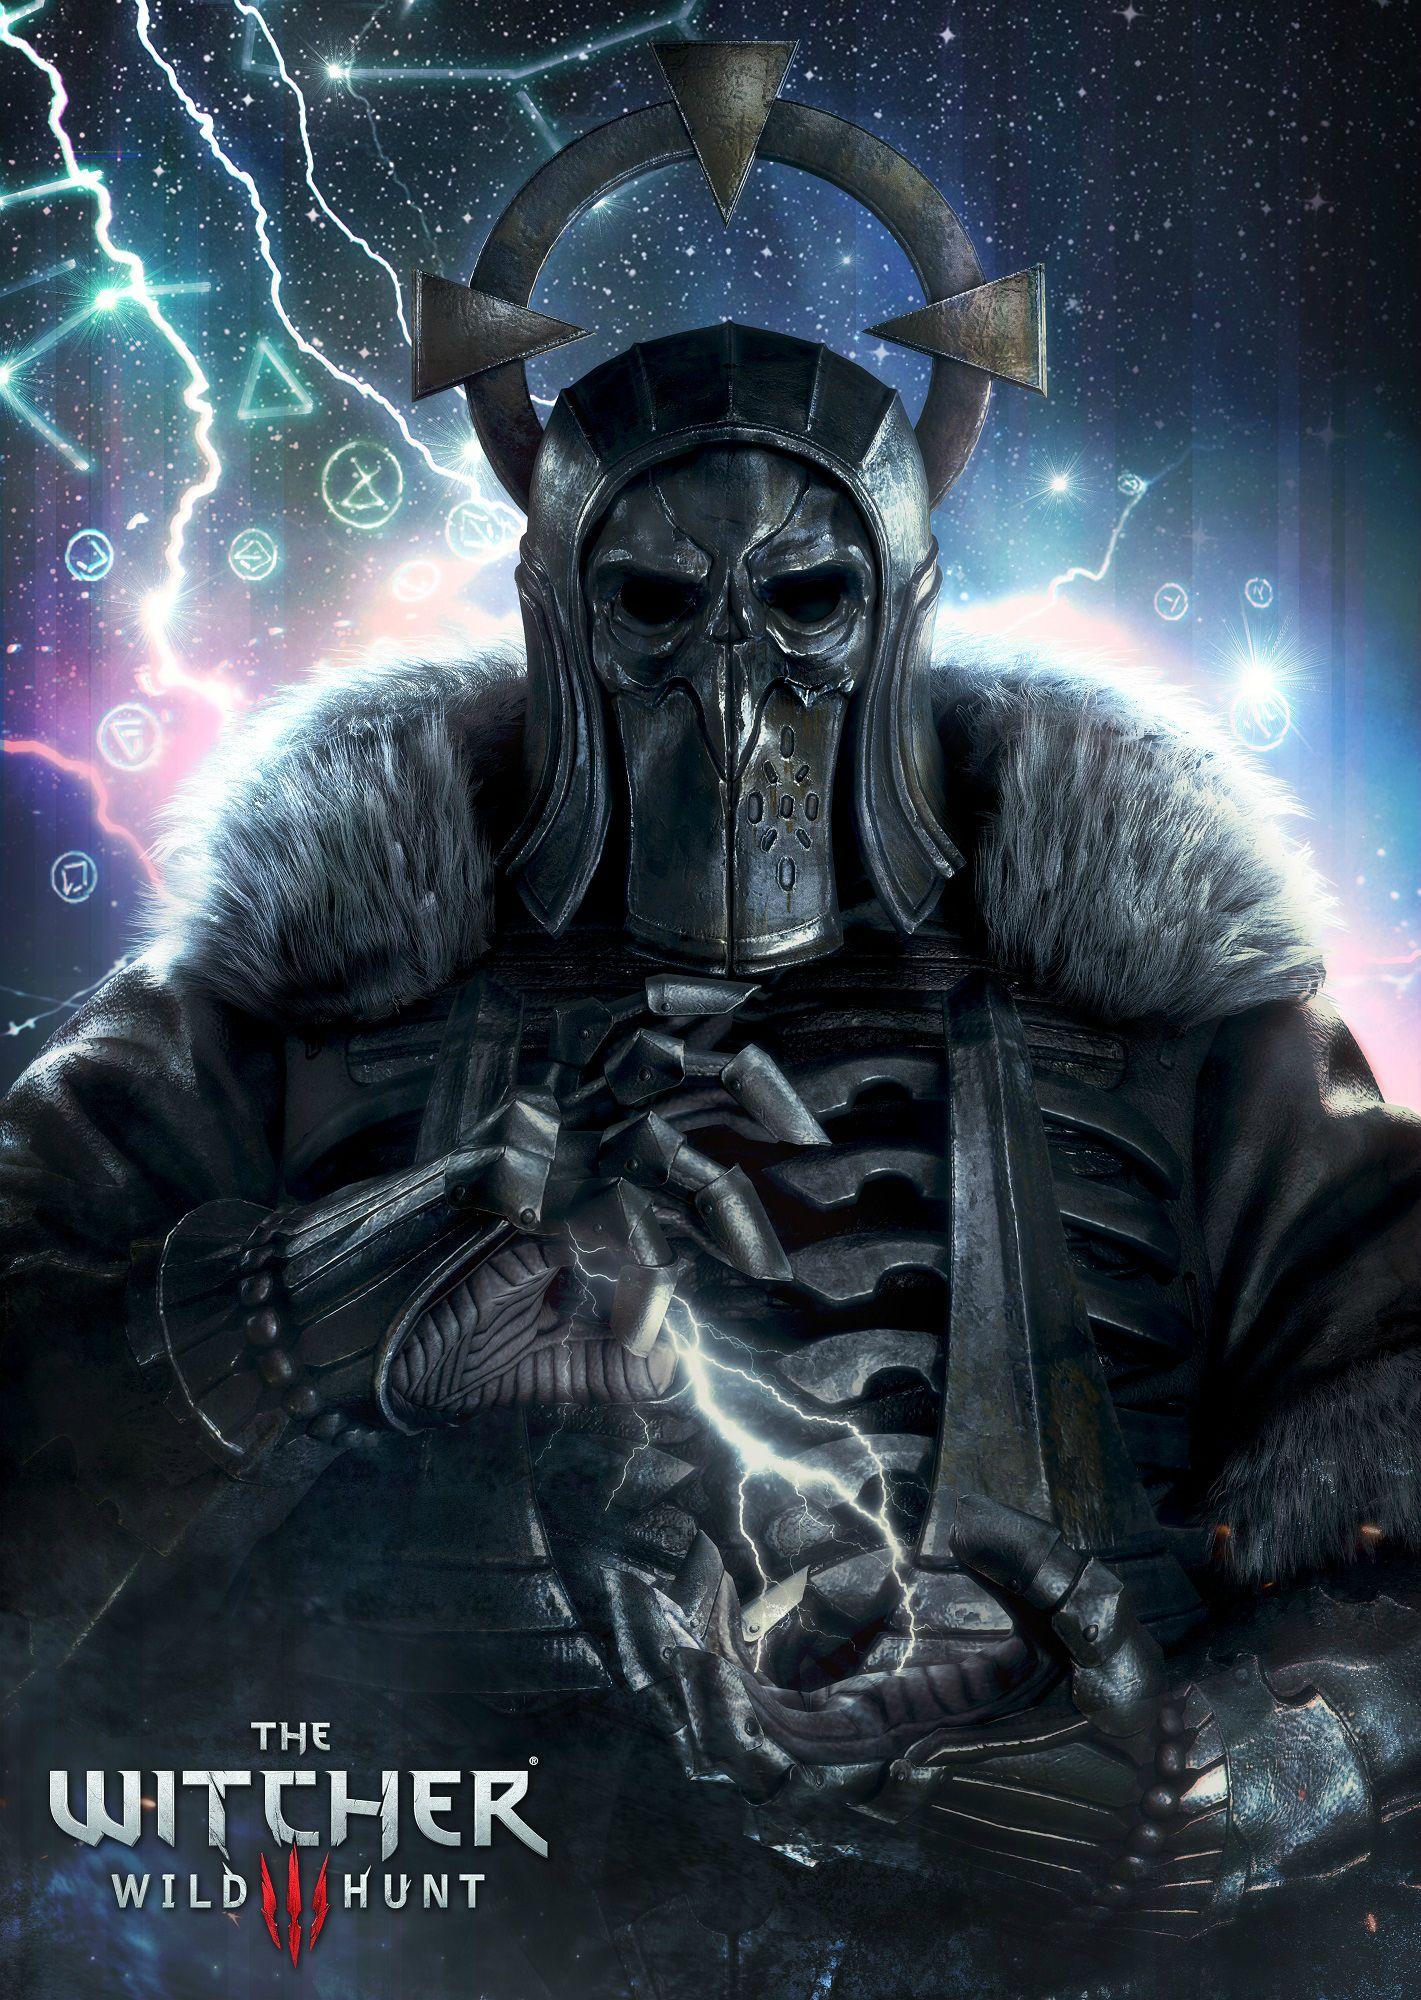 Ciri and caranthir vs rey and kylo ren spacebattles forums - The witcher 3 caranthir ...